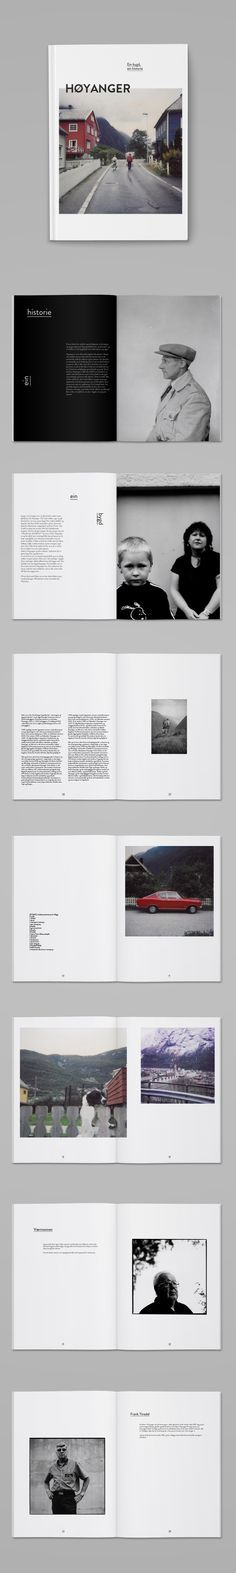 Book design - Oh Yeah Studio